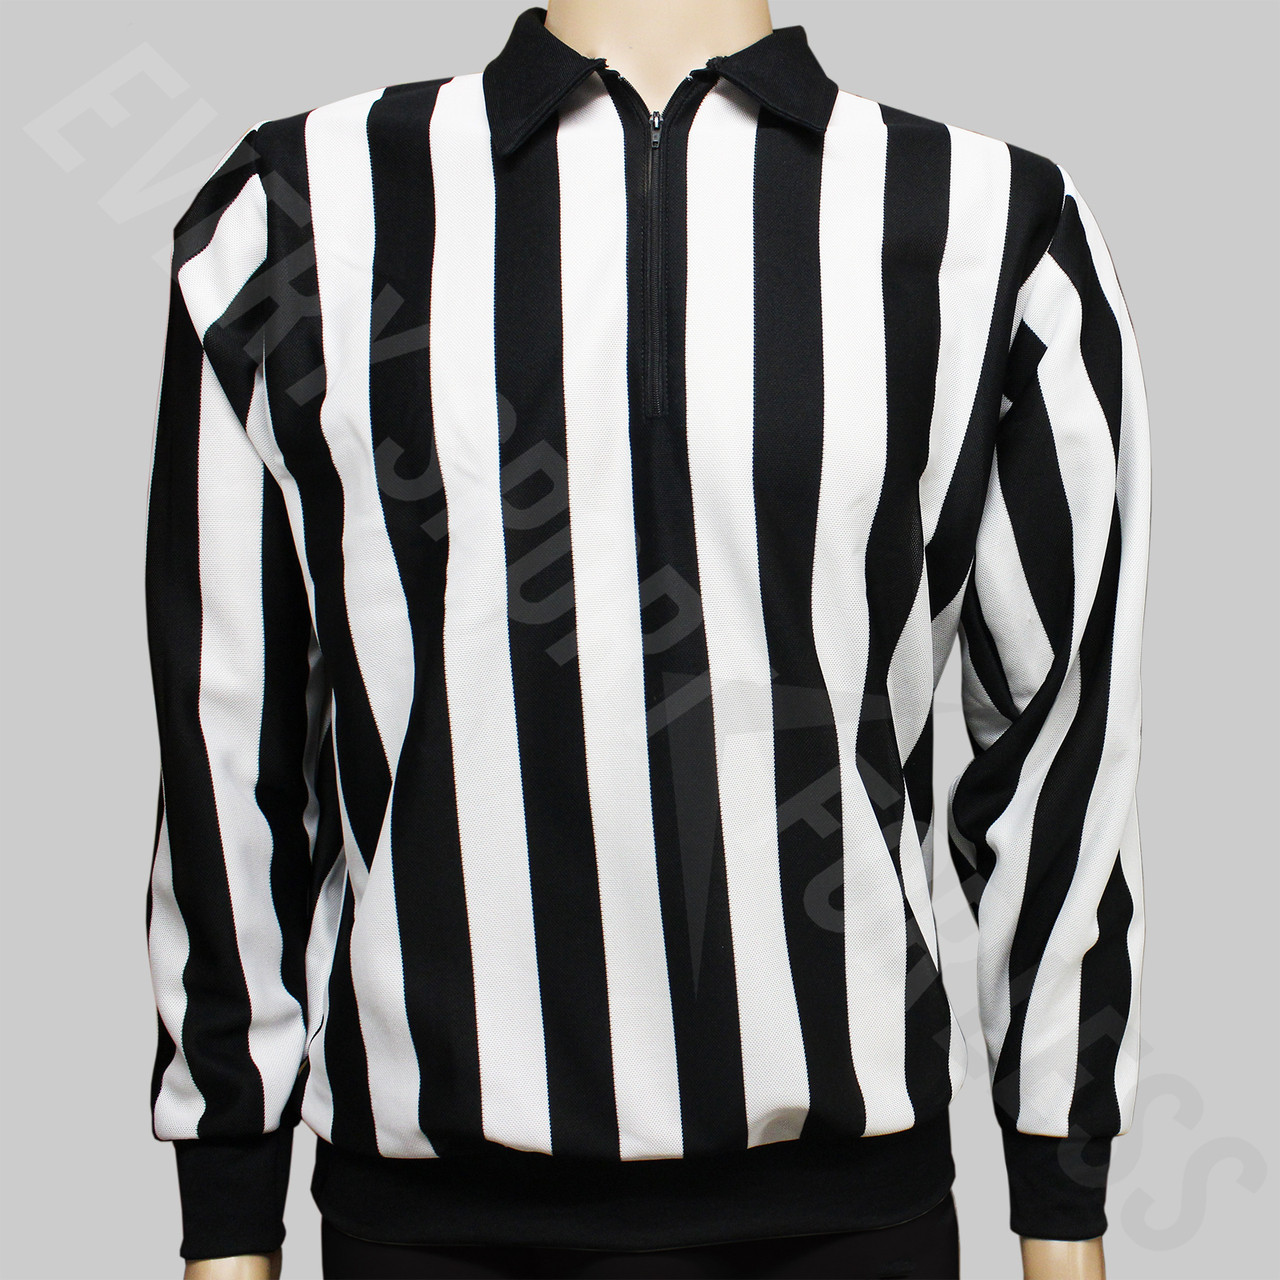 c430852d3 ... CCM 150 Official Senior Hockey Referee Shirt - Black, White Stripes